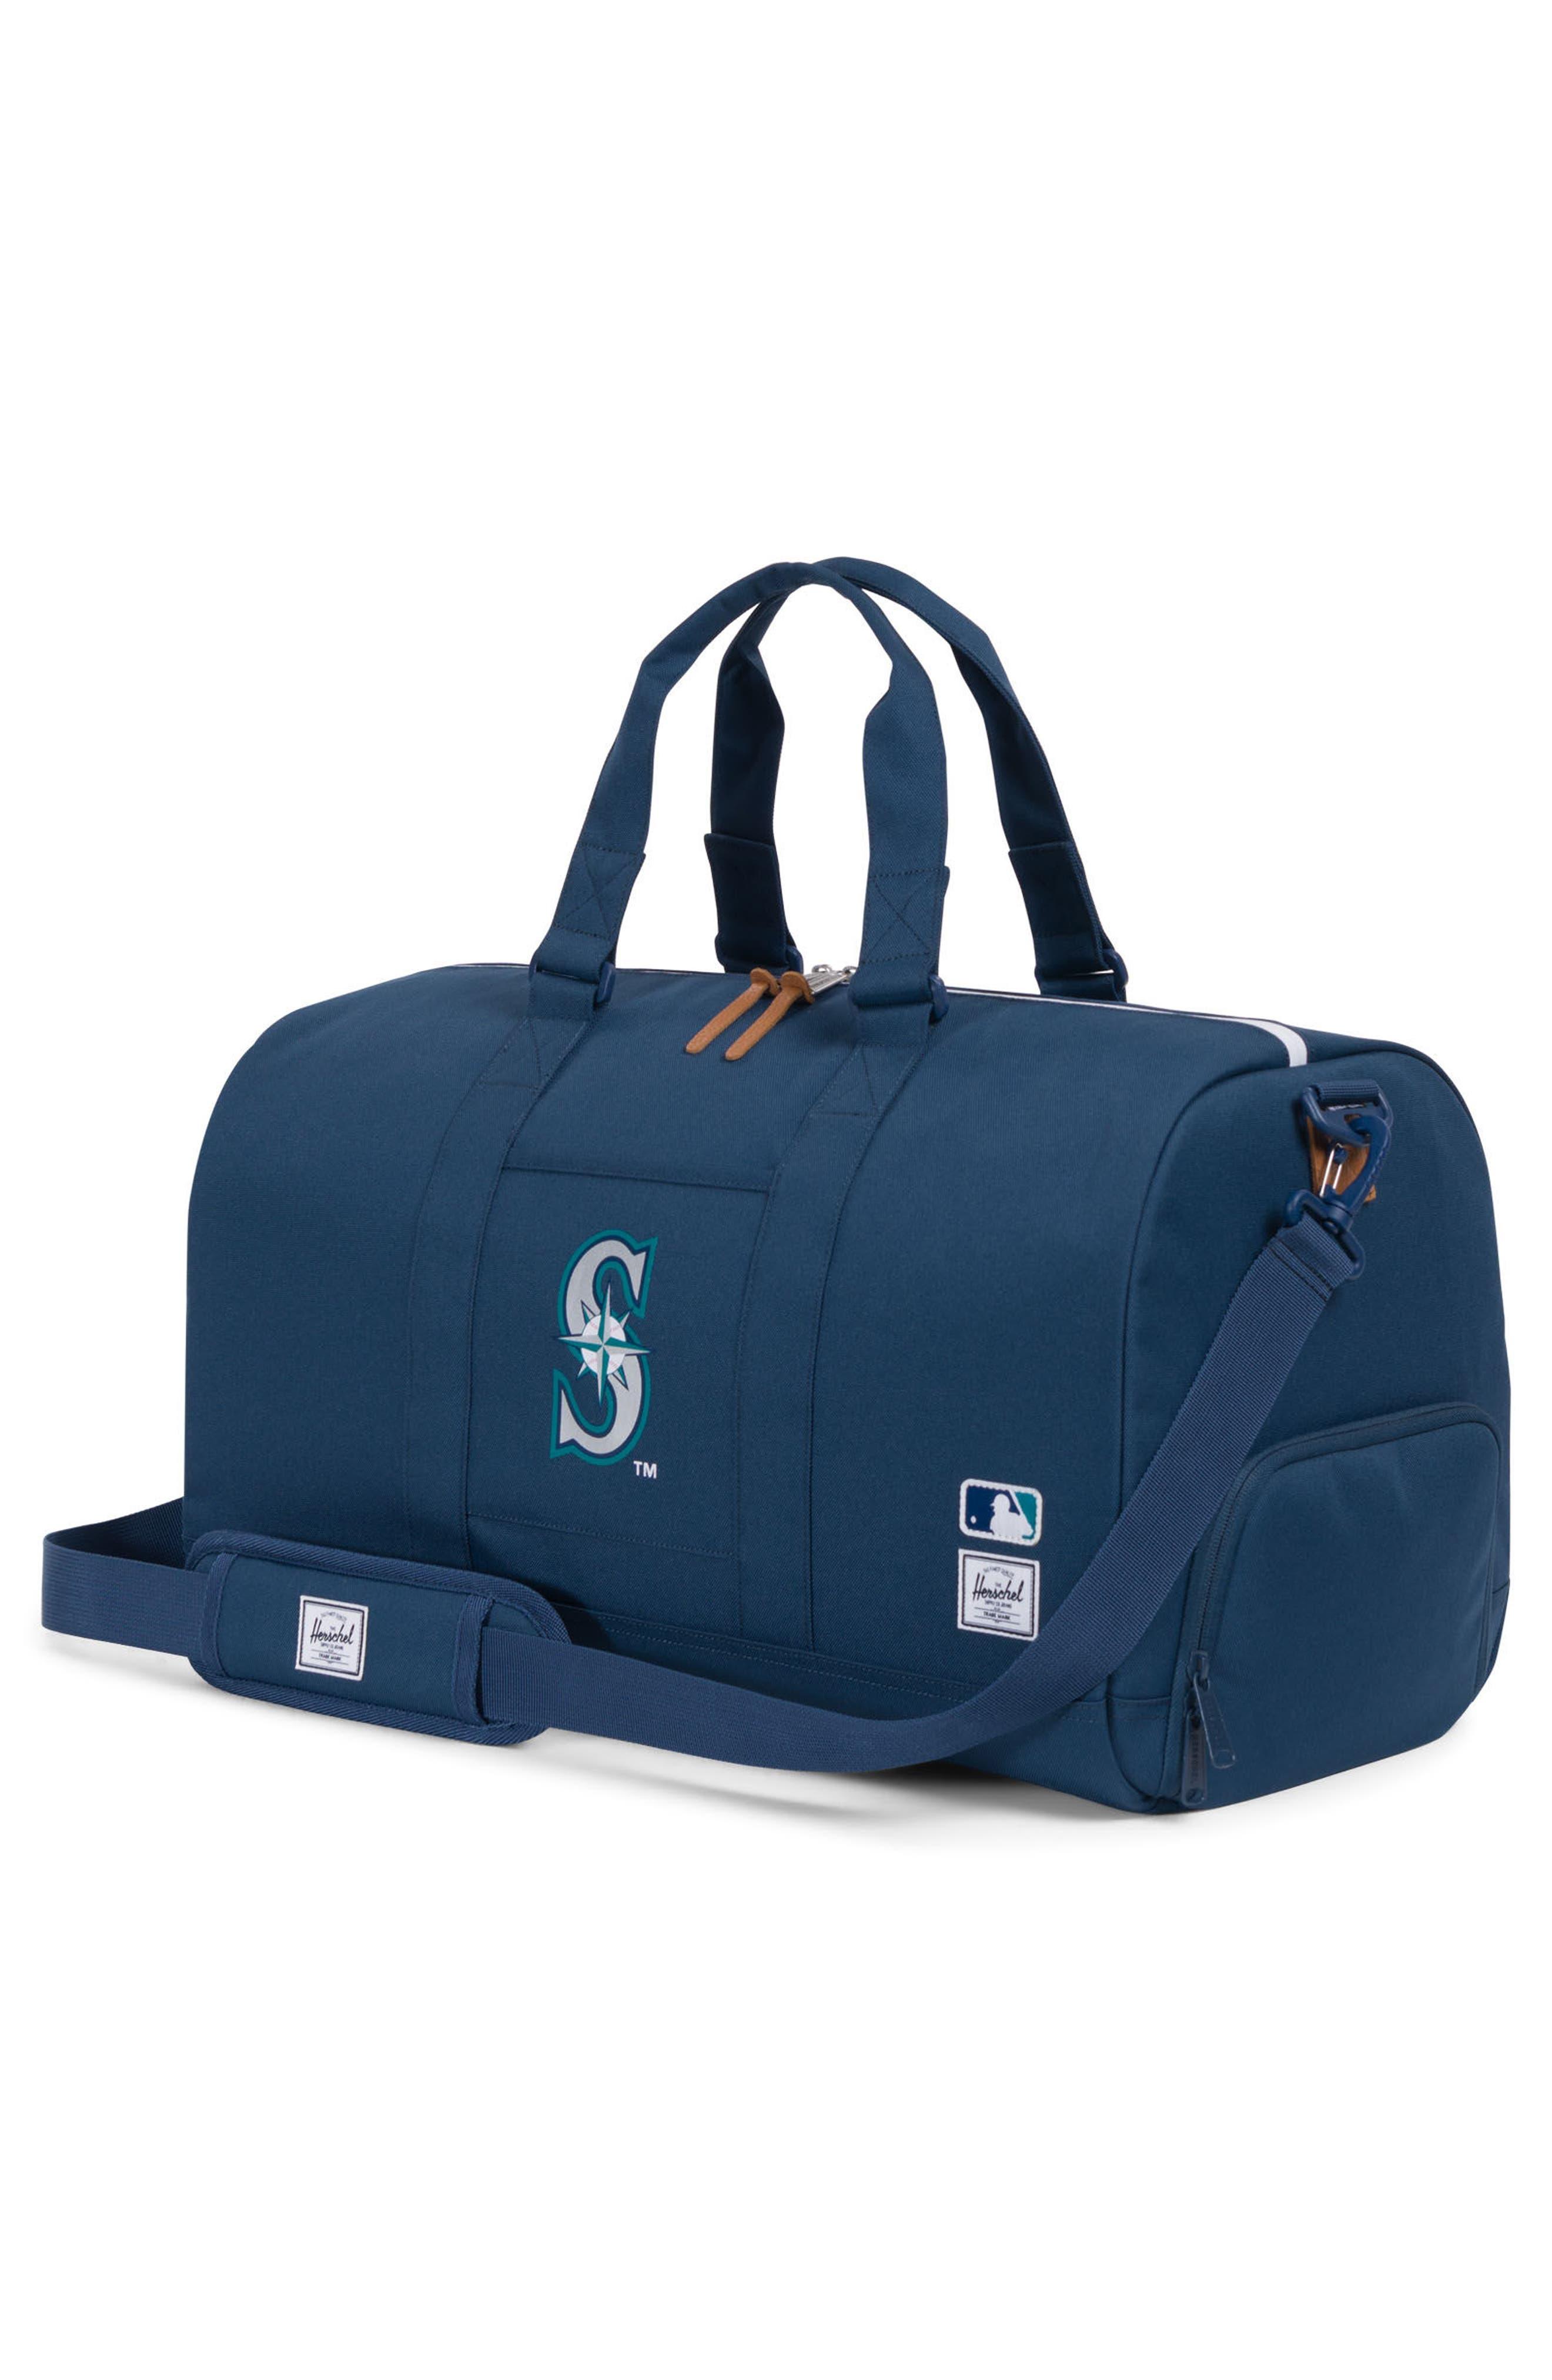 Novel - MLB American League Duffel Bag,                             Alternate thumbnail 3, color,                             SEATTLE MARINERS